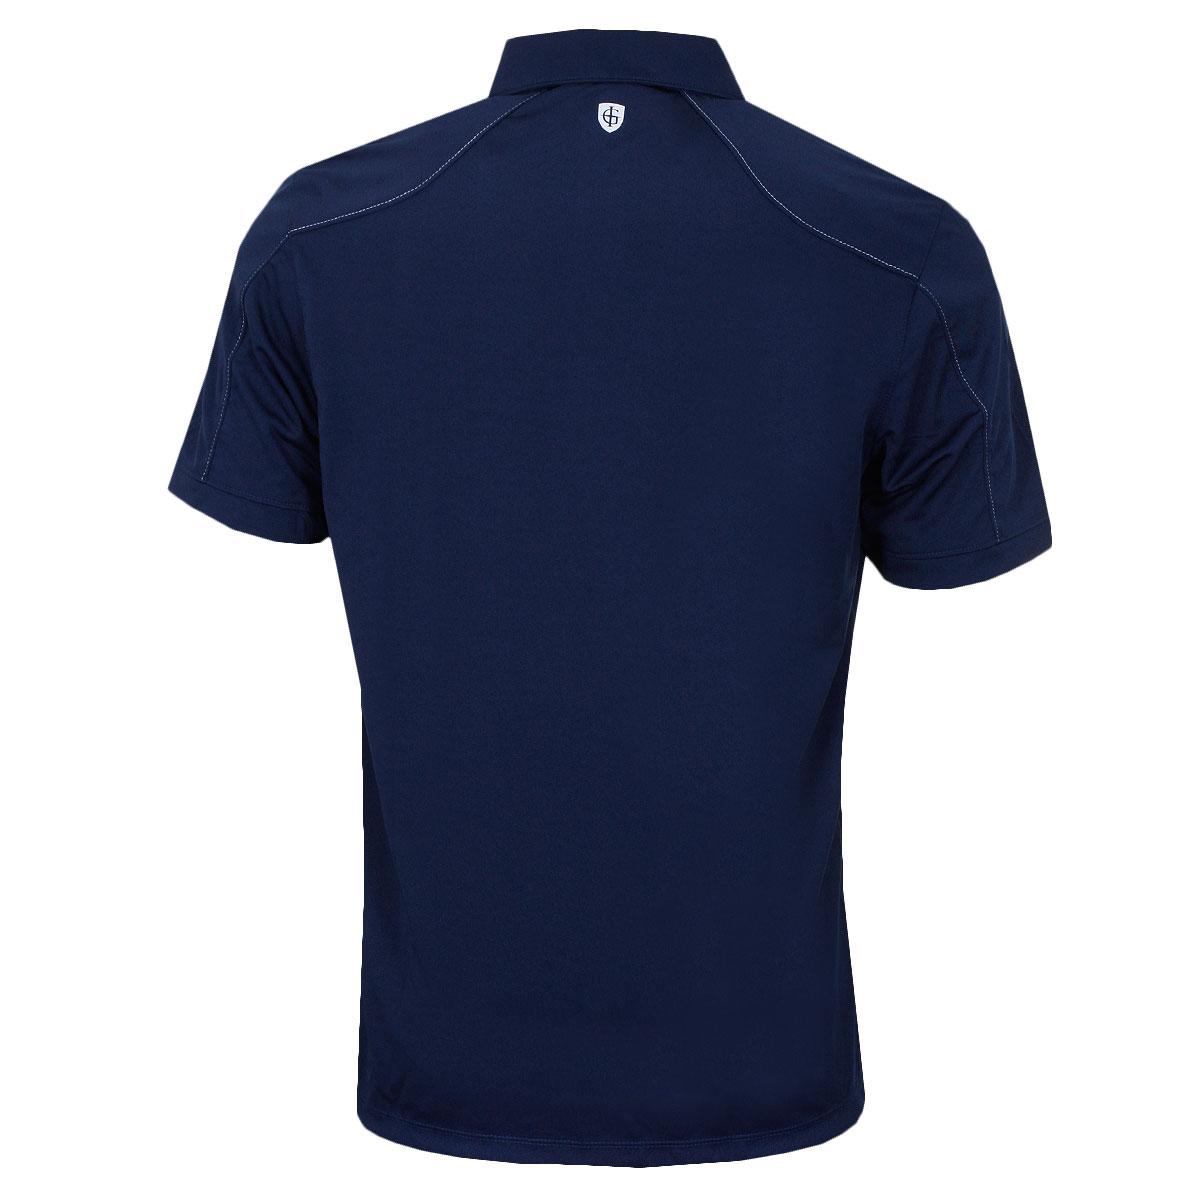 Island-Green-Mens-Golf-IGTS1648-Performance-Coolpass-Polo-Shirt-39-OFF-RRP thumbnail 12